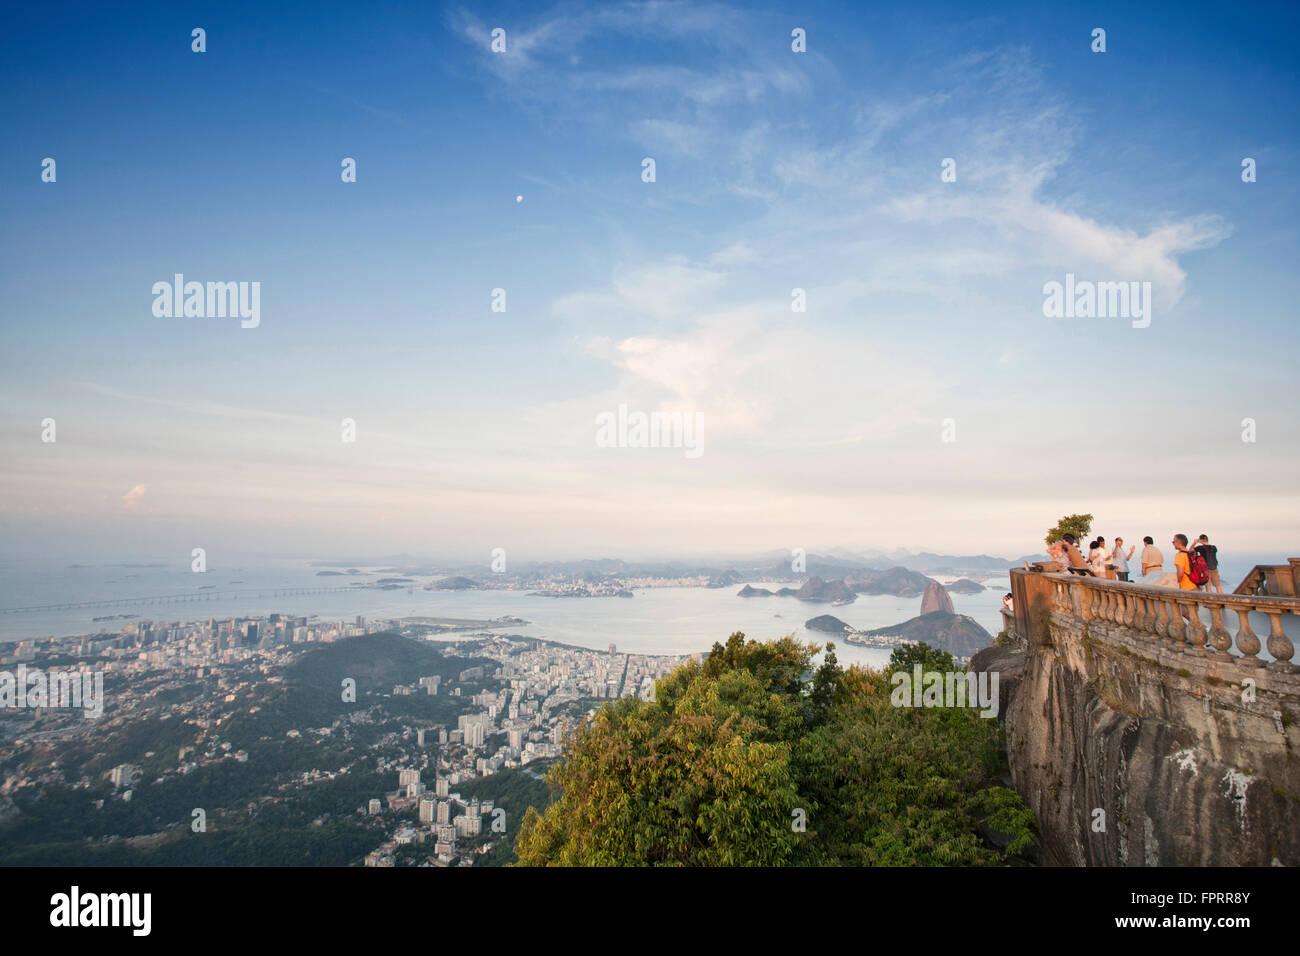 Rio de Janeiro, Corcovado, view of Guanabara Bay, Rio from the Christ statue, - Stock Image